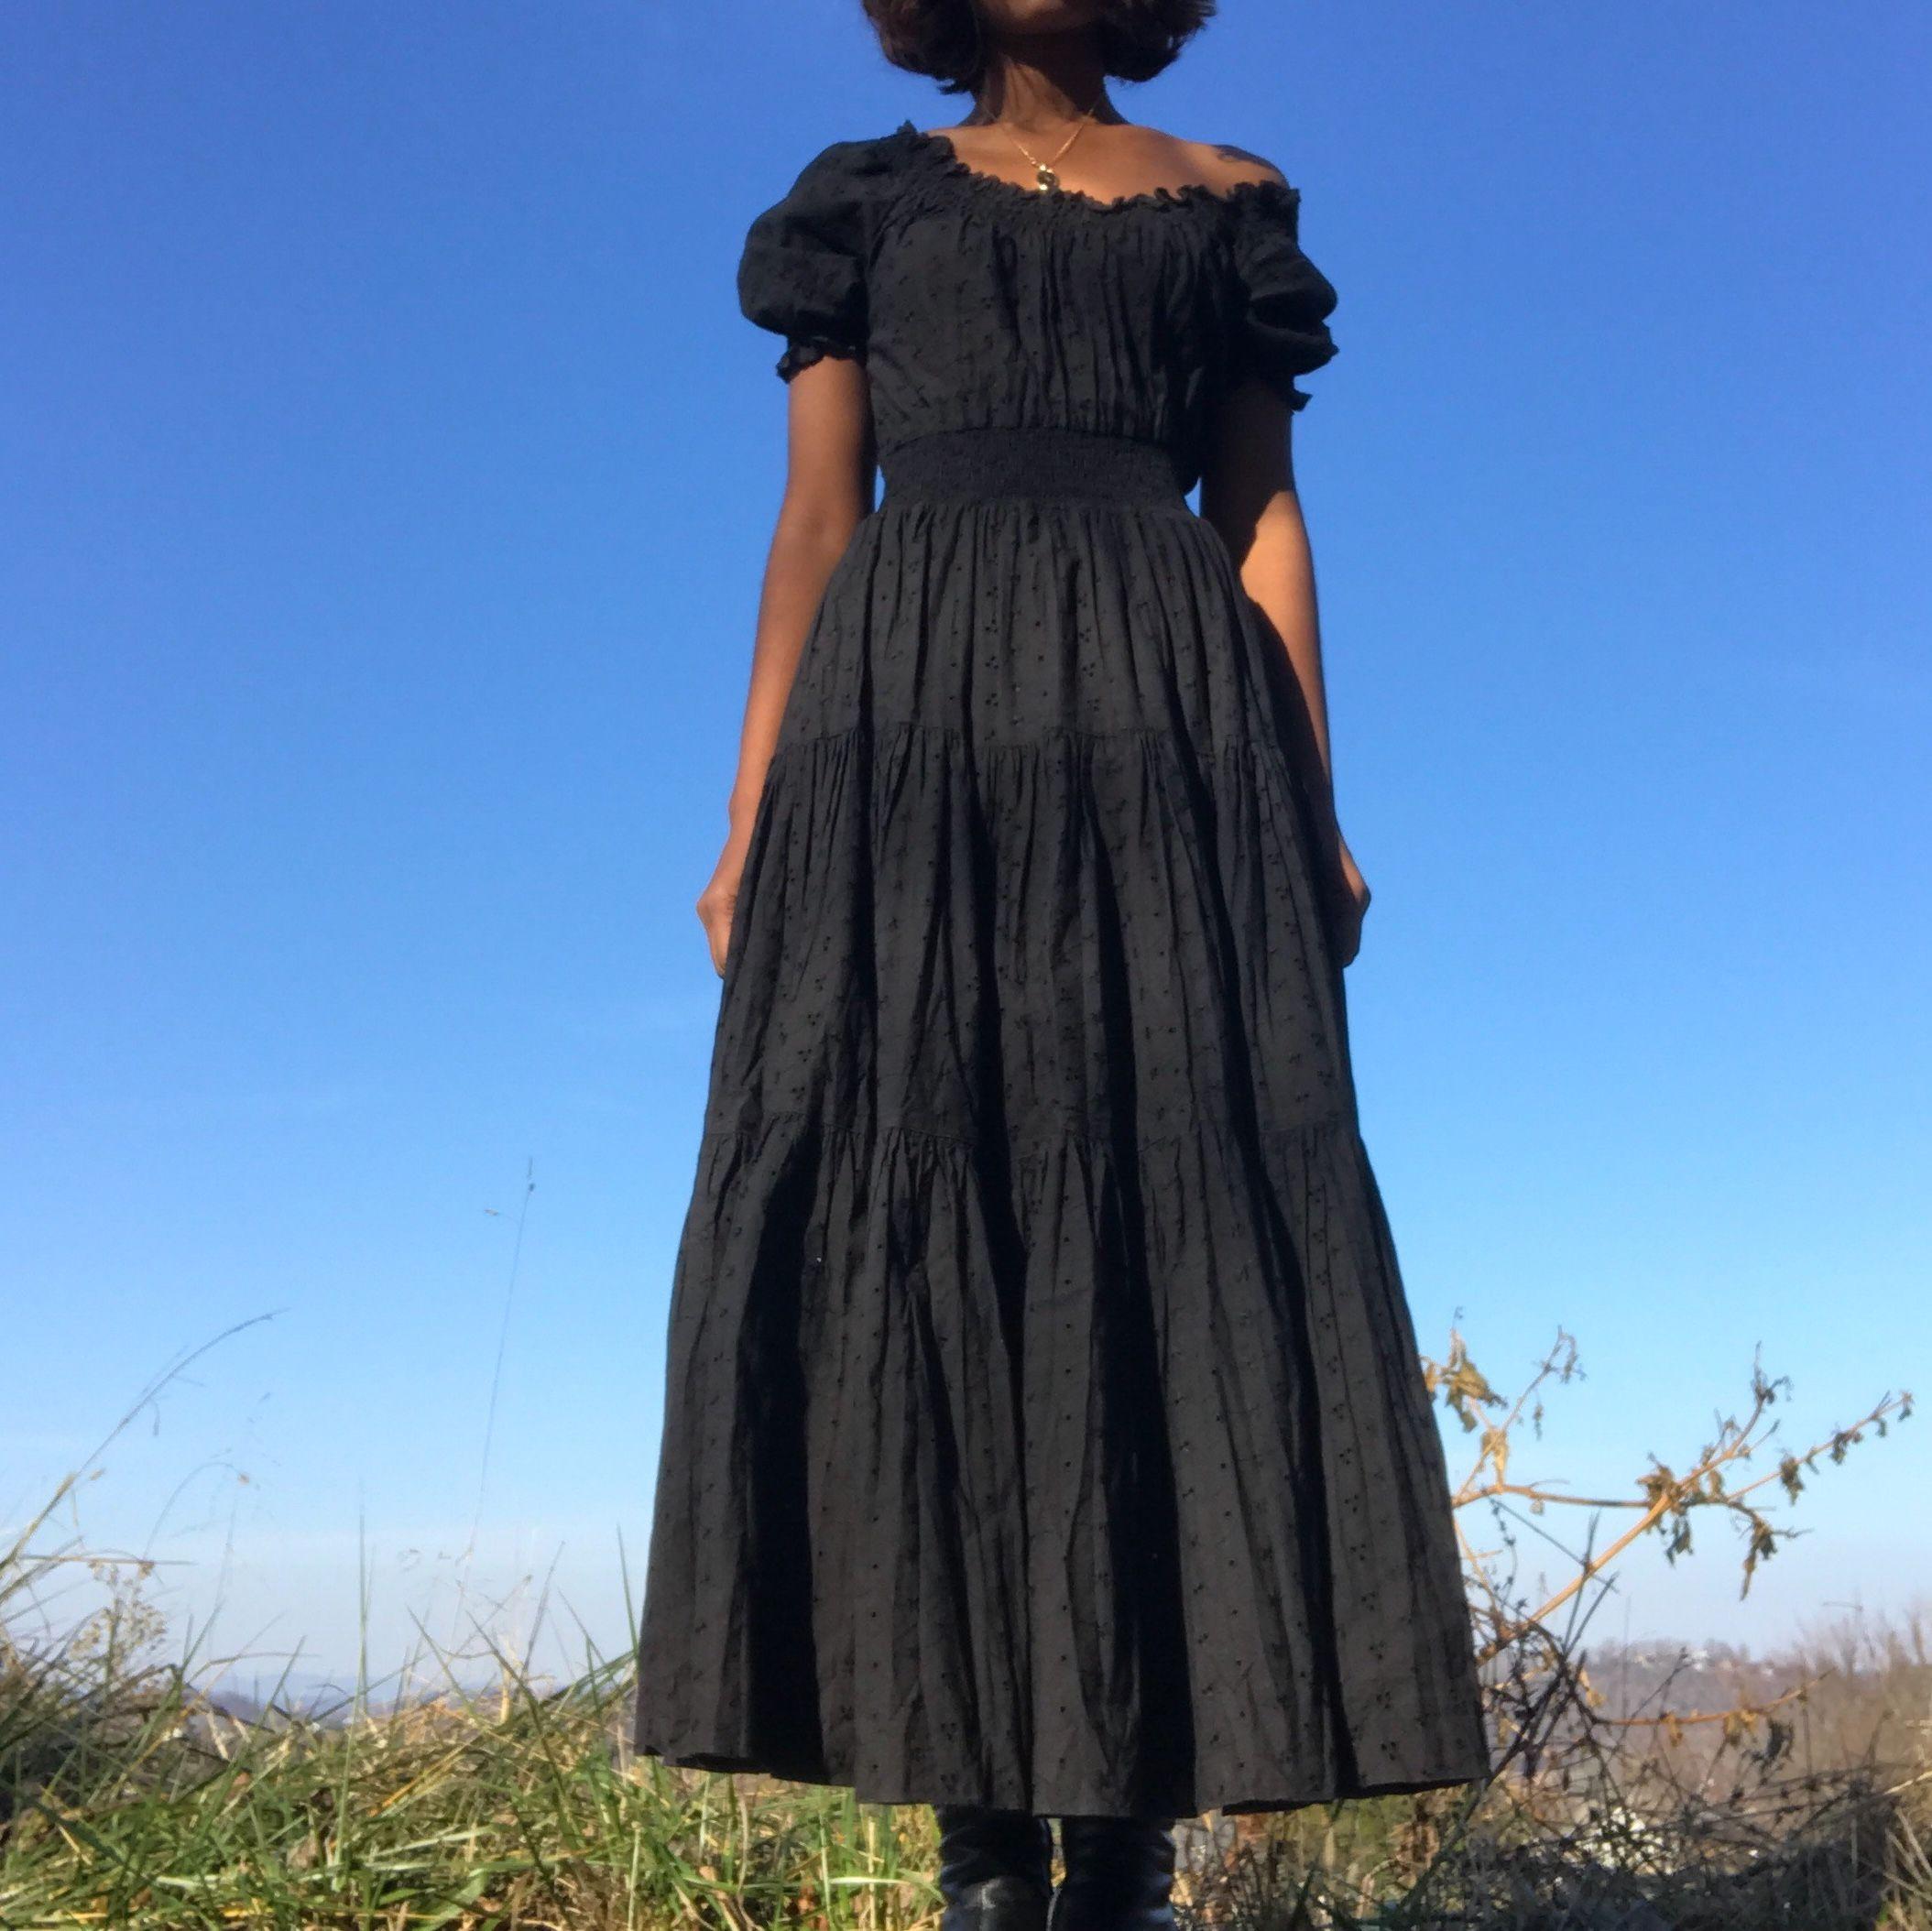 Vintage 70s Dress Vintage Dress Dress Retro 1970s Party Dresses Halter Dress Black Dress Gothic Dress Vintage Dress 70s Grunge Dress Fashion [ 1099 x 736 Pixel ]